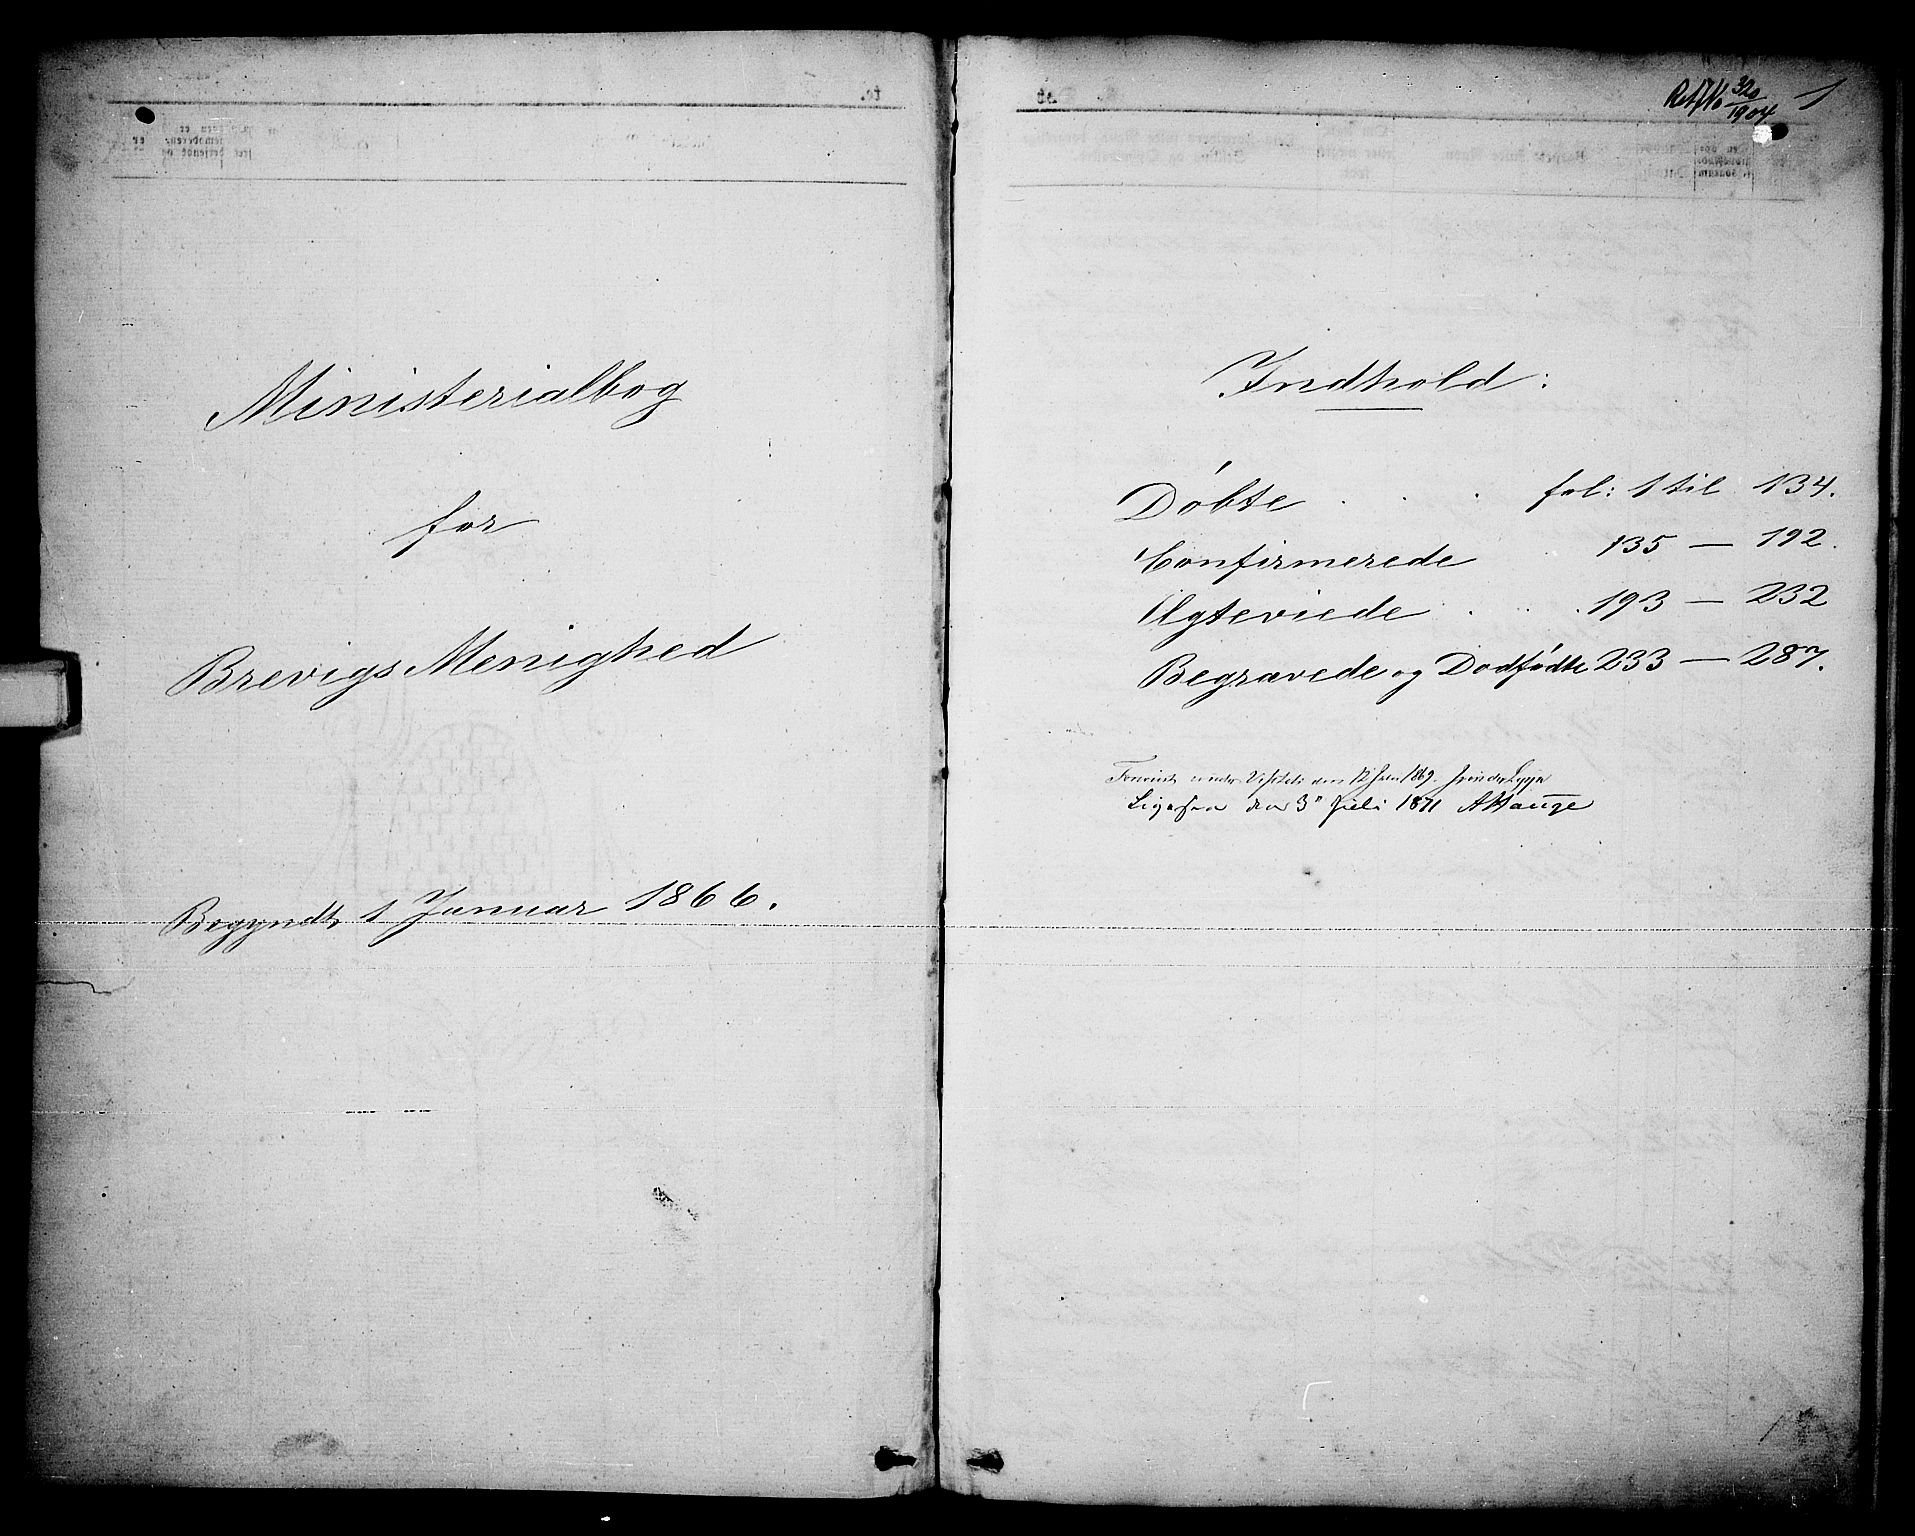 SAKO, Brevik kirkebøker, G/Ga/L0003: Klokkerbok nr. 3, 1866-1881, s. 1